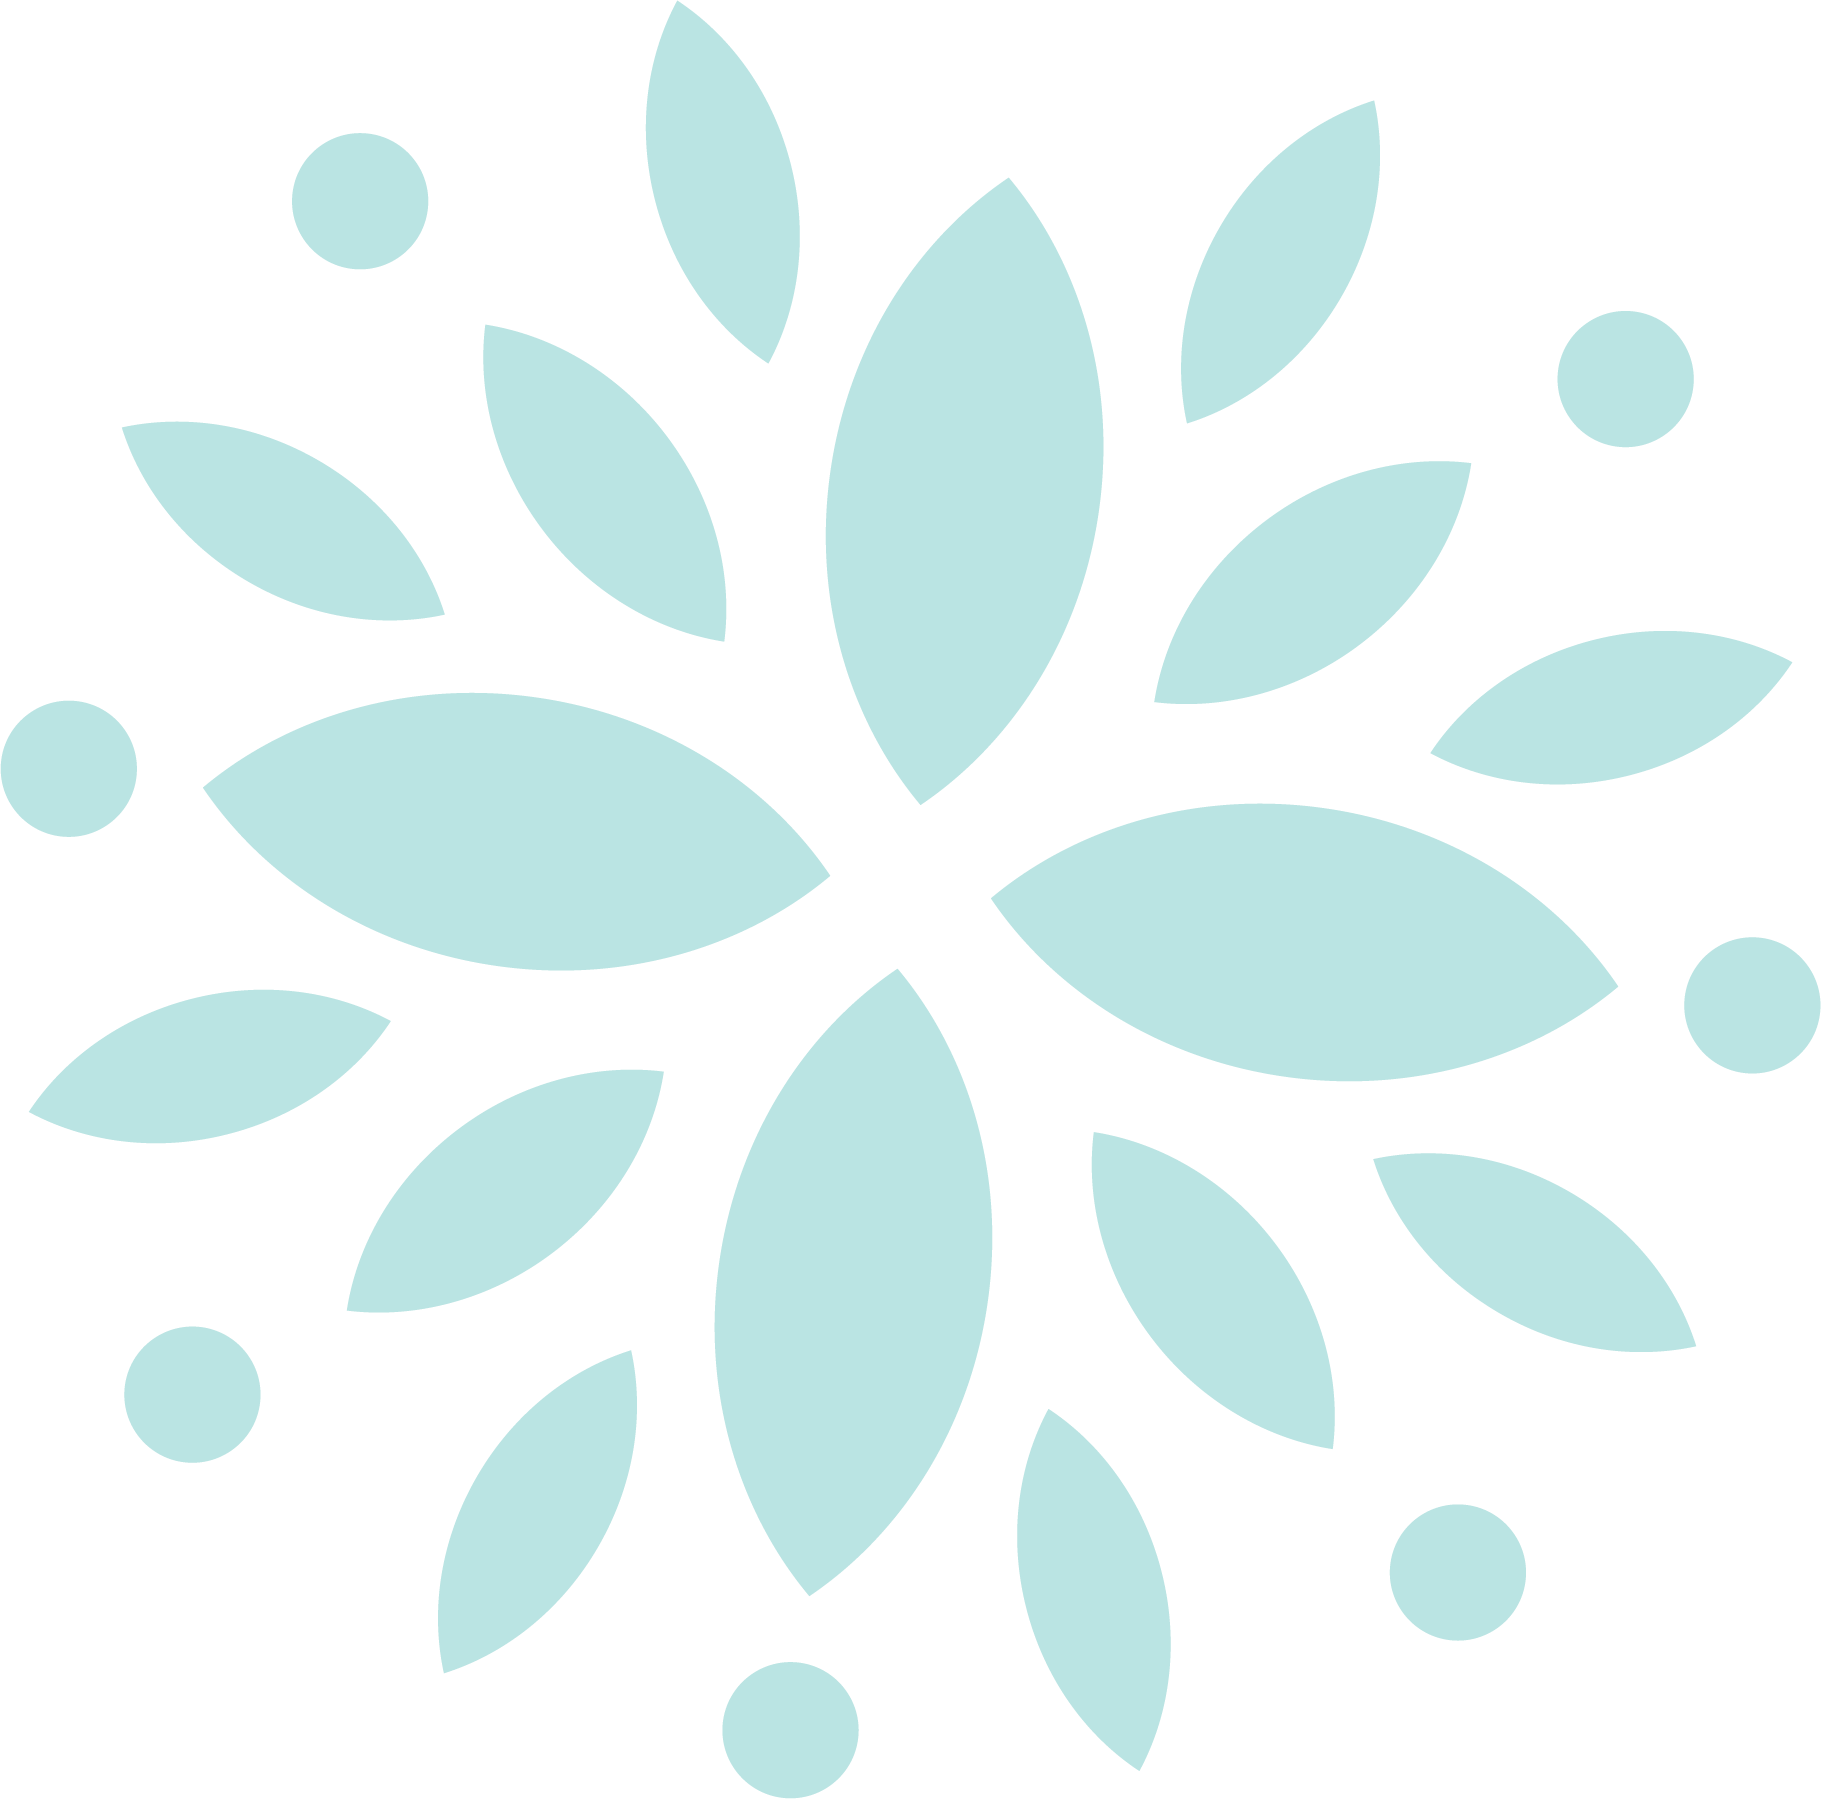 floral graphic - blue